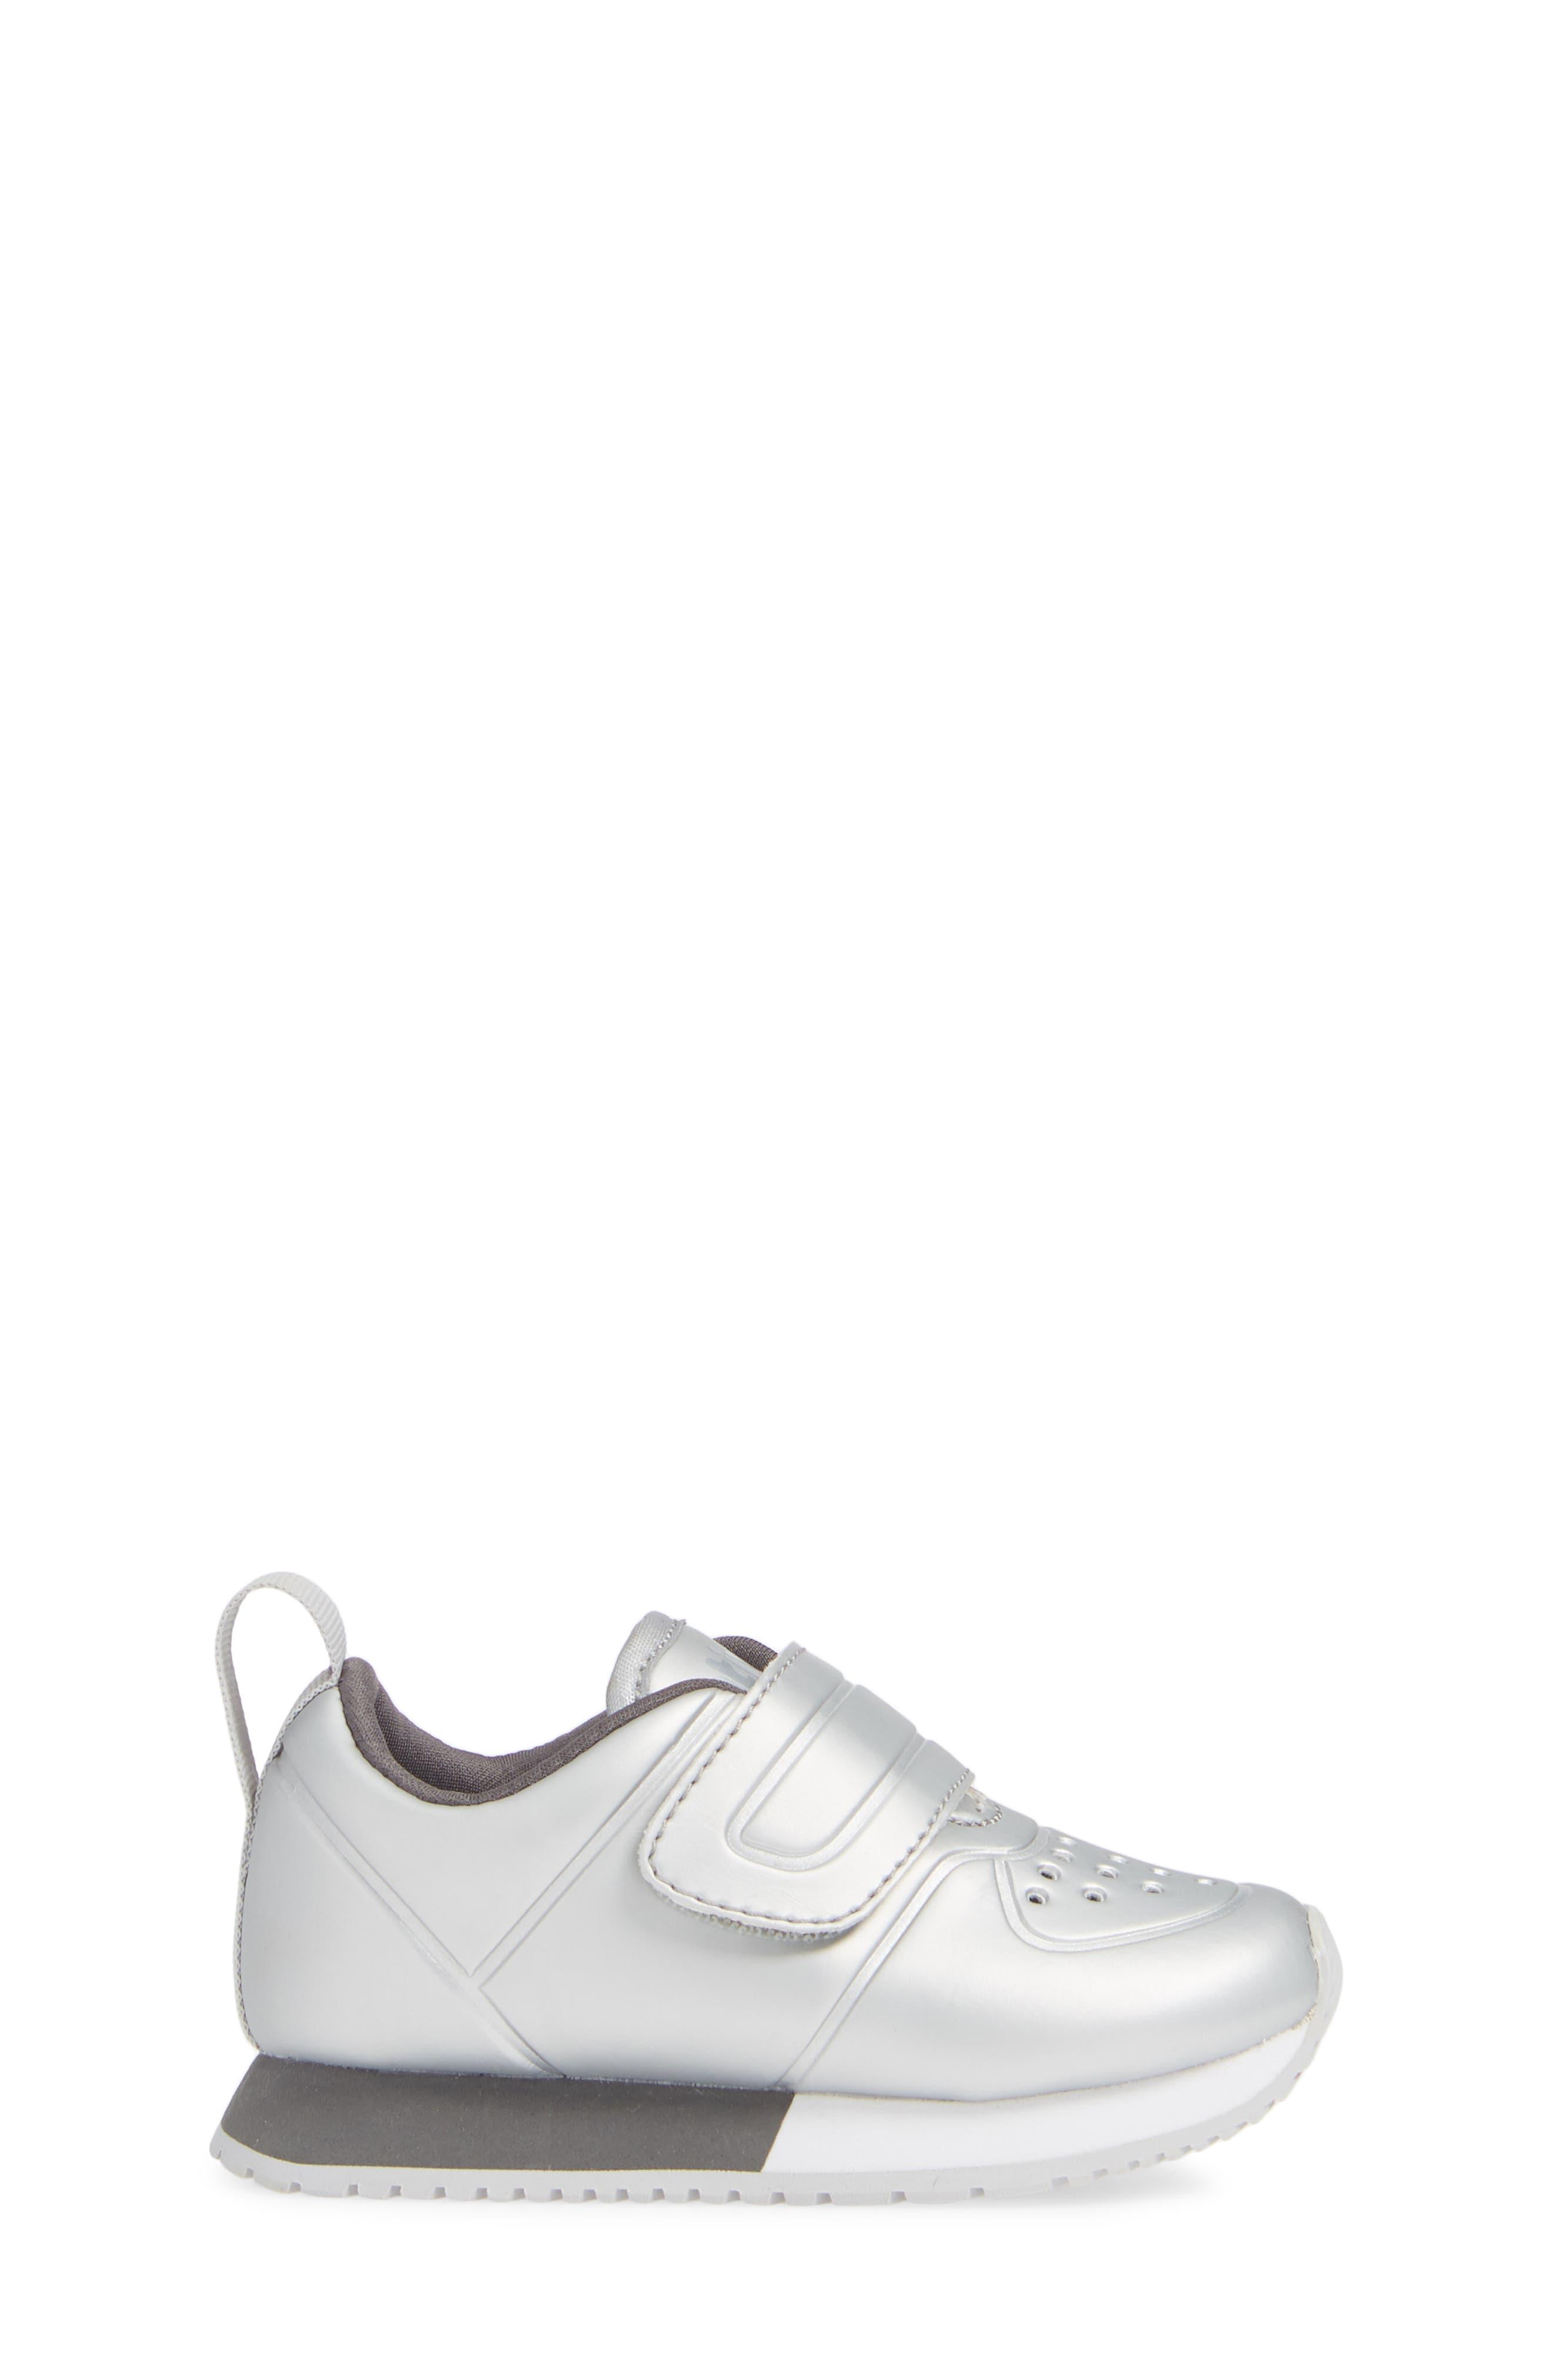 Cornell Perforated Metallic Sneaker,                             Alternate thumbnail 3, color,                             SILVER/ WHITE/ DUBLIN GREY